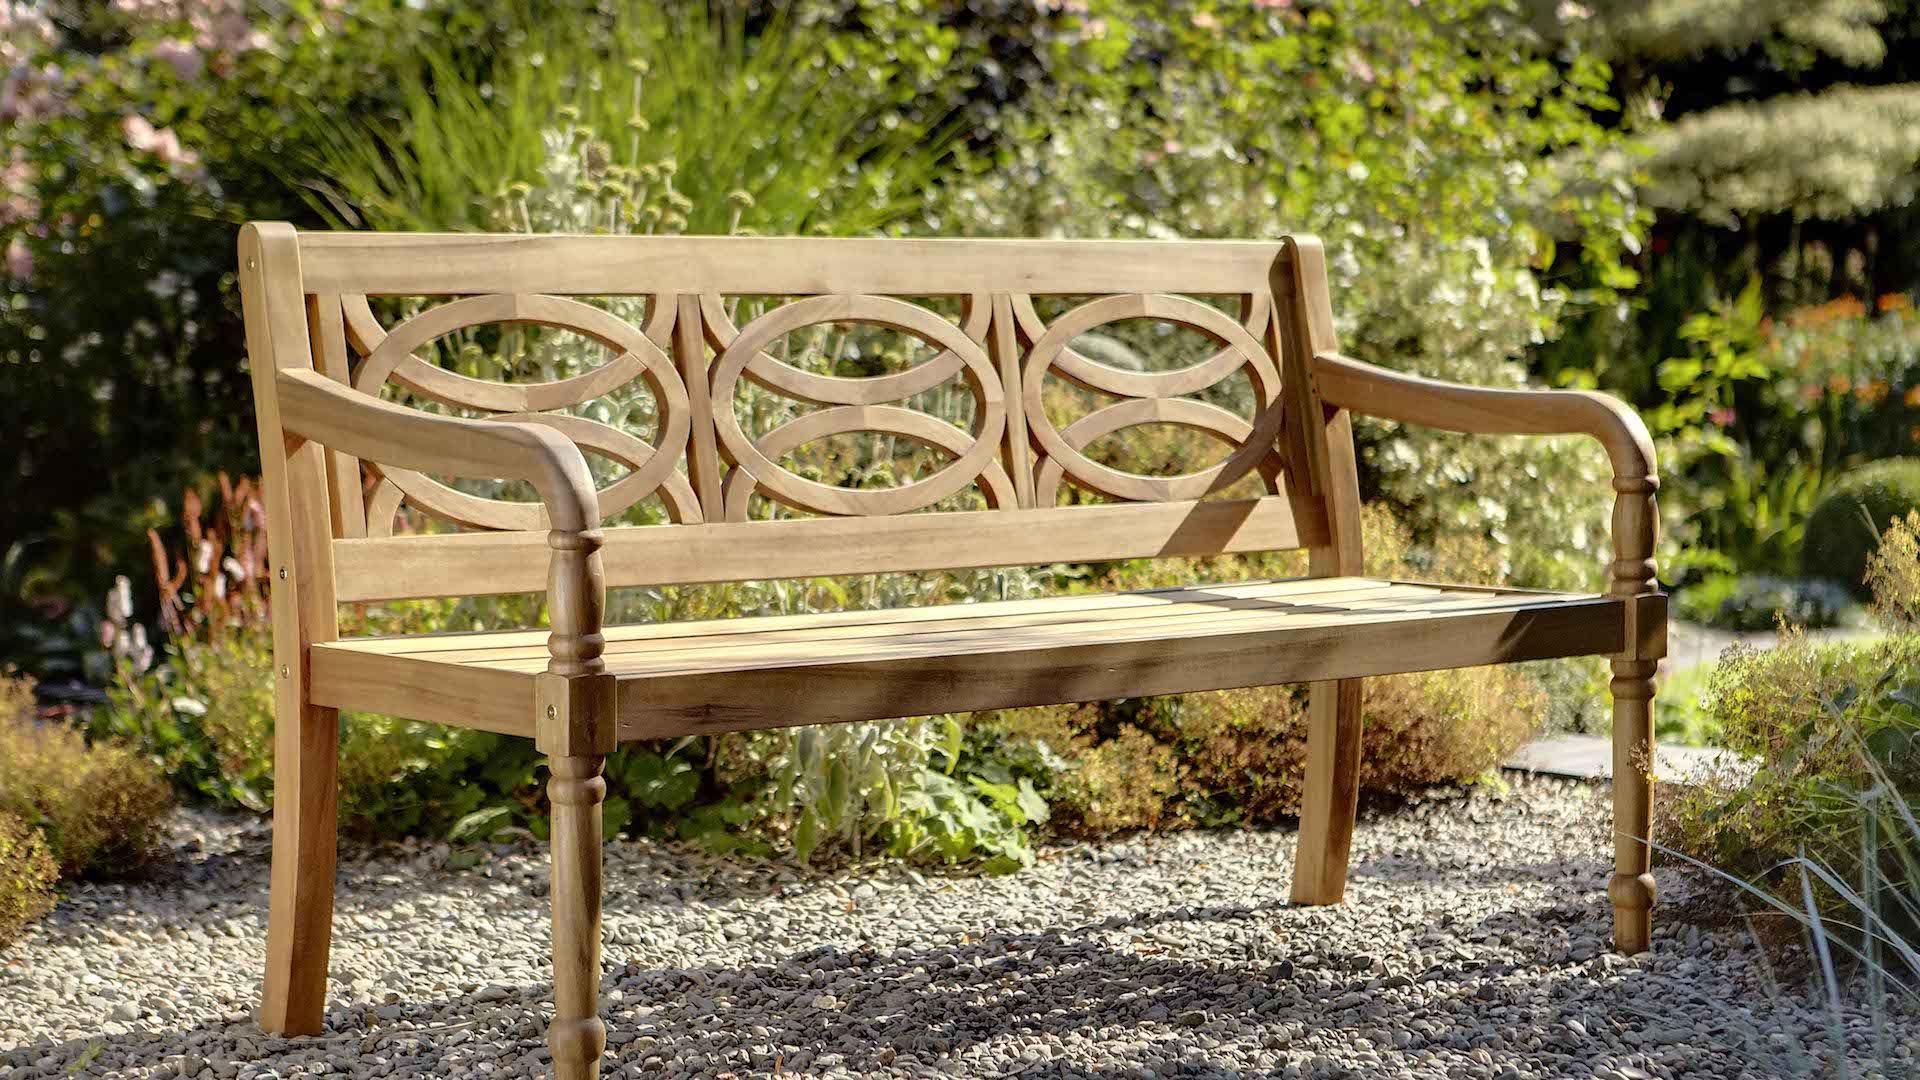 Cleobury 3 Seat Bench – Cleobury – Wood Garden Furniture With Amabel Patio Diamond Wooden Garden Benches (View 20 of 25)